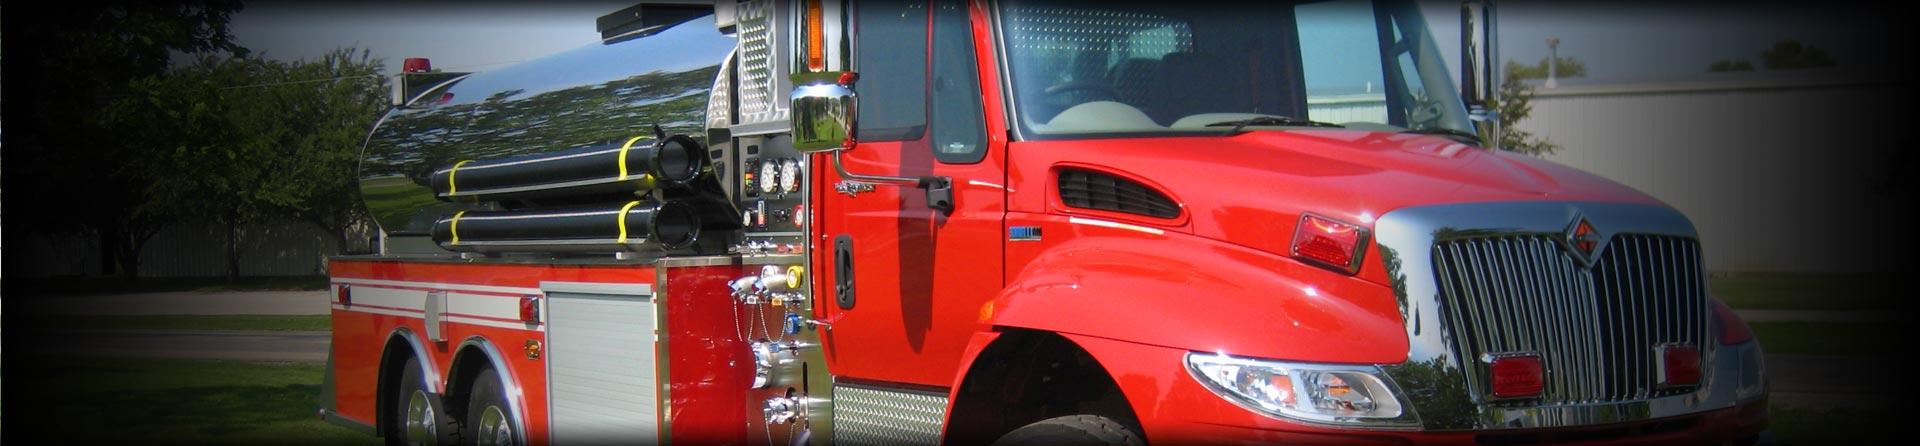 Dominator Fire Apparatus Series Banner